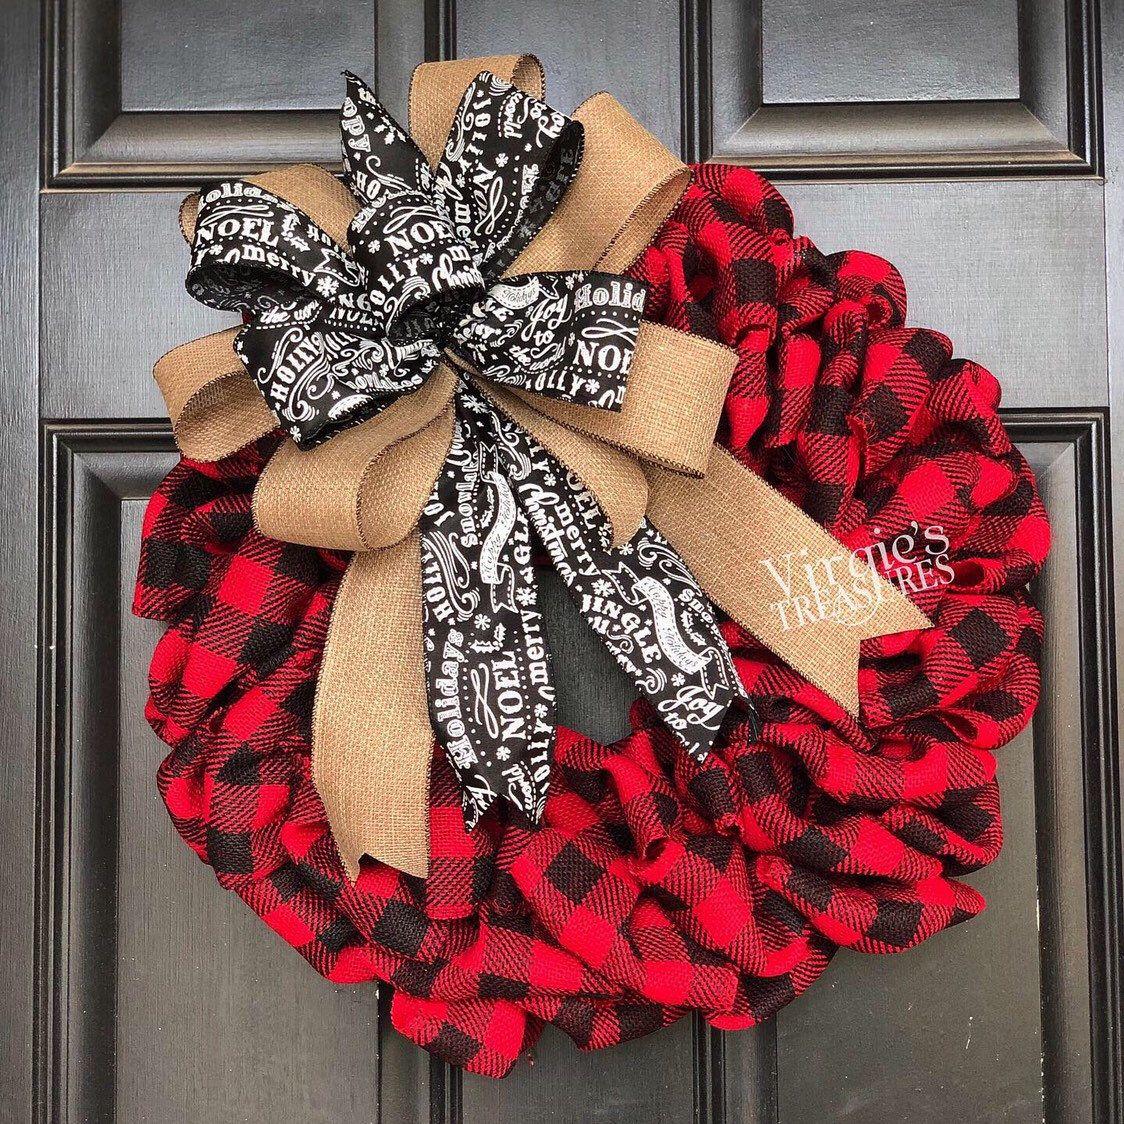 Photo of Buffalo Plaid Wreath, Front Door Wreath, Holiday Wreath, Red Black Buffalo Plaid Wreath, Farmhouse Wreath, Christmas Wreath, Winter Wreath